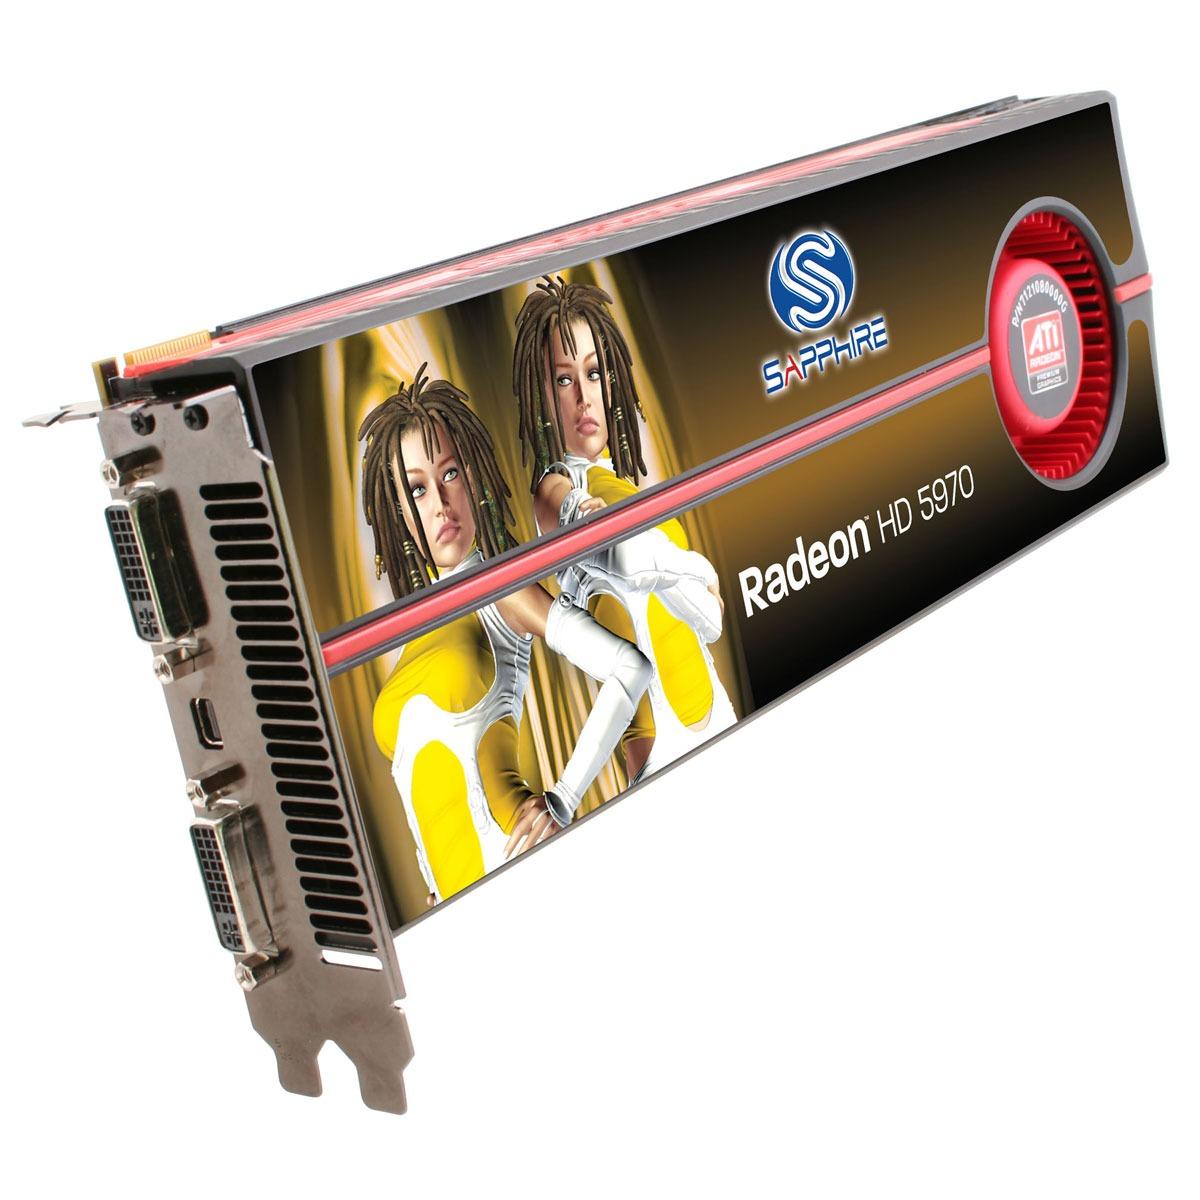 Carte graphique Sapphire Radeon HD 5970 2 Go Sapphire Radeon HD 5970 - 2 Go Dual DVI/Mini DisplayPort - PCI Express (ATI Radeon HD 5970)